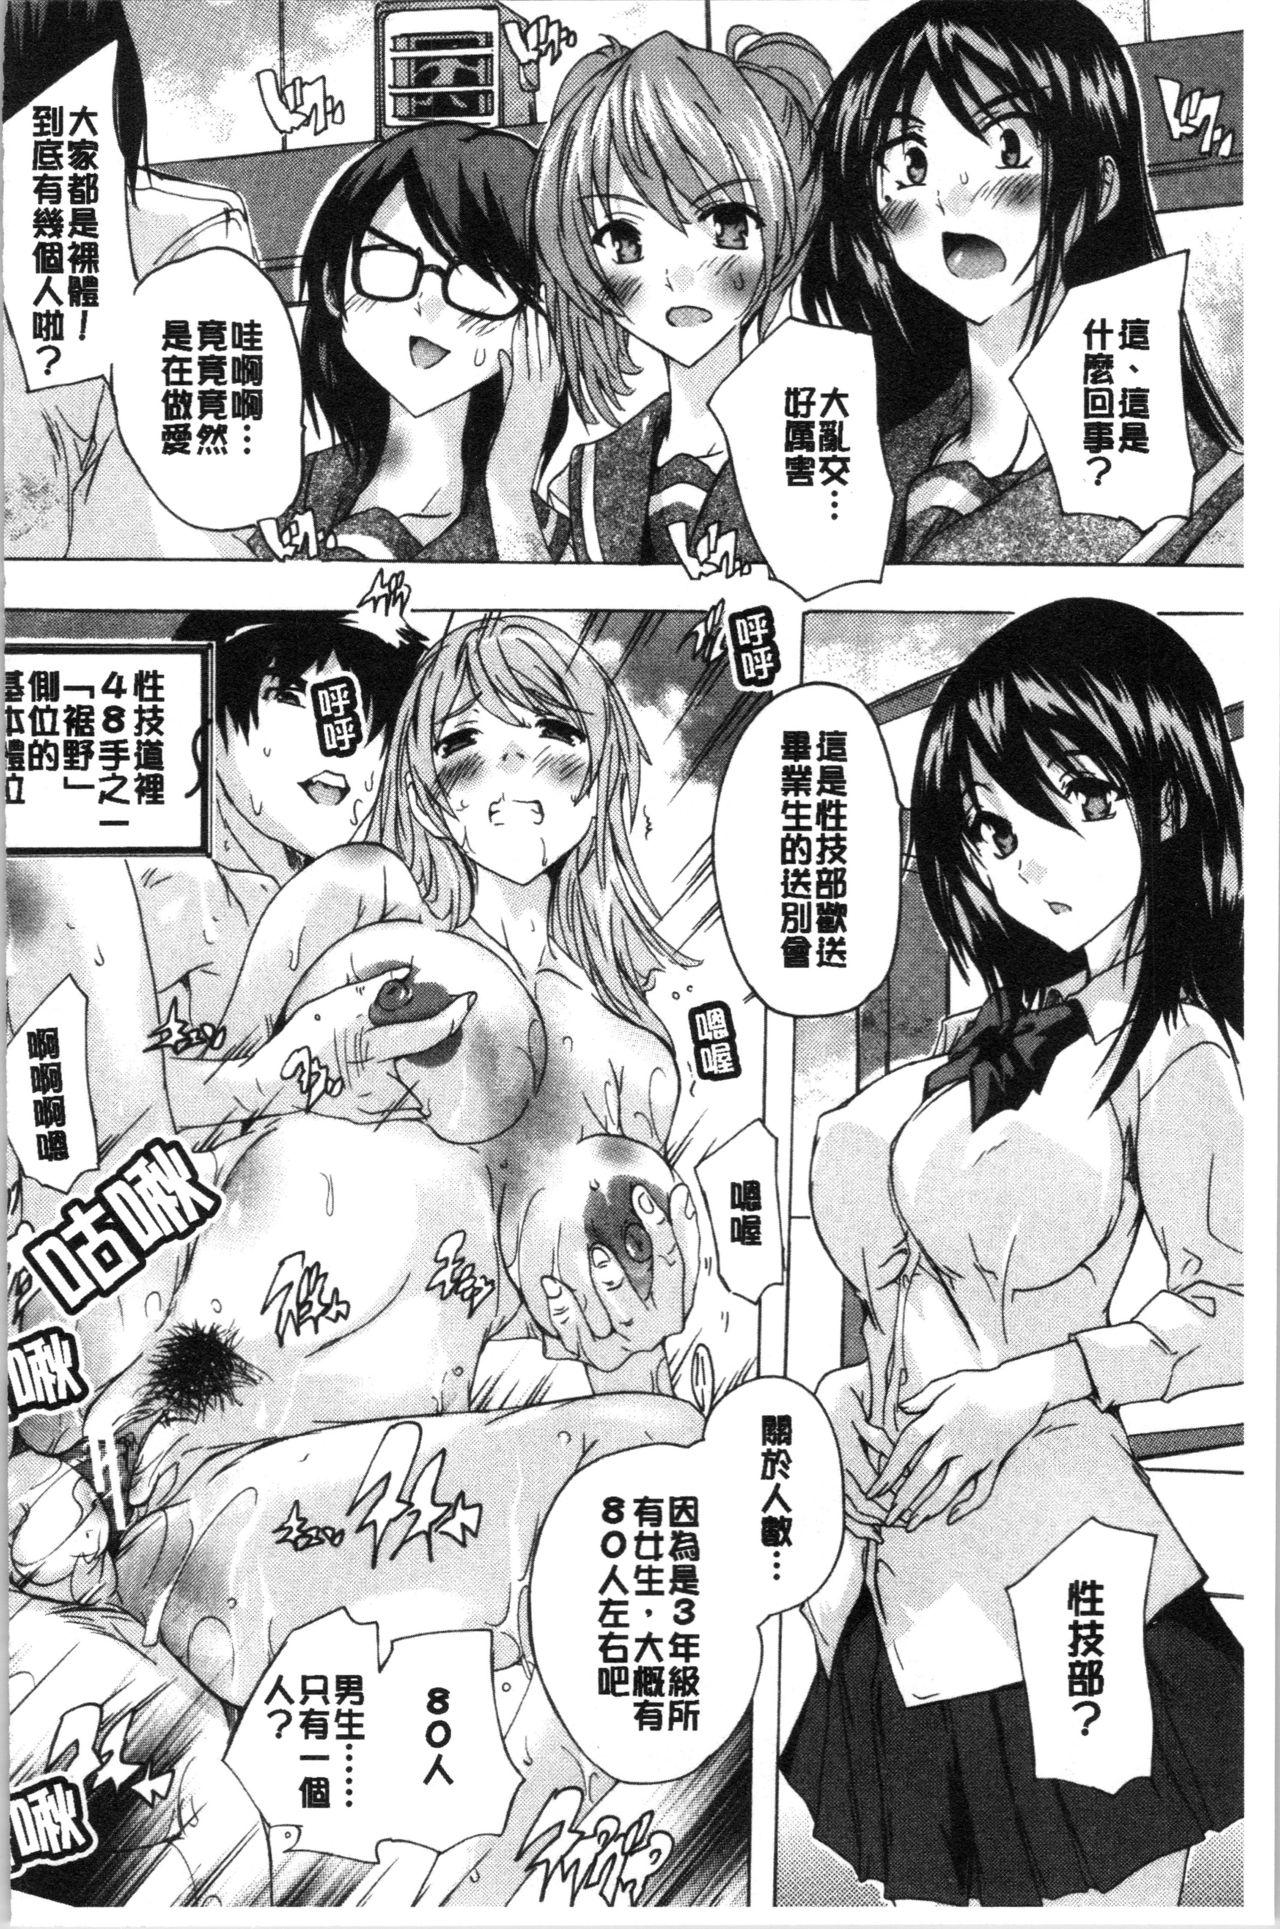 [Natsuka Q-Ya] Hisshuu!! Sex-bu - SEIGI-DO The Ultimate Martial Arts   必修!!性愛淫交部 [Chinese] 178